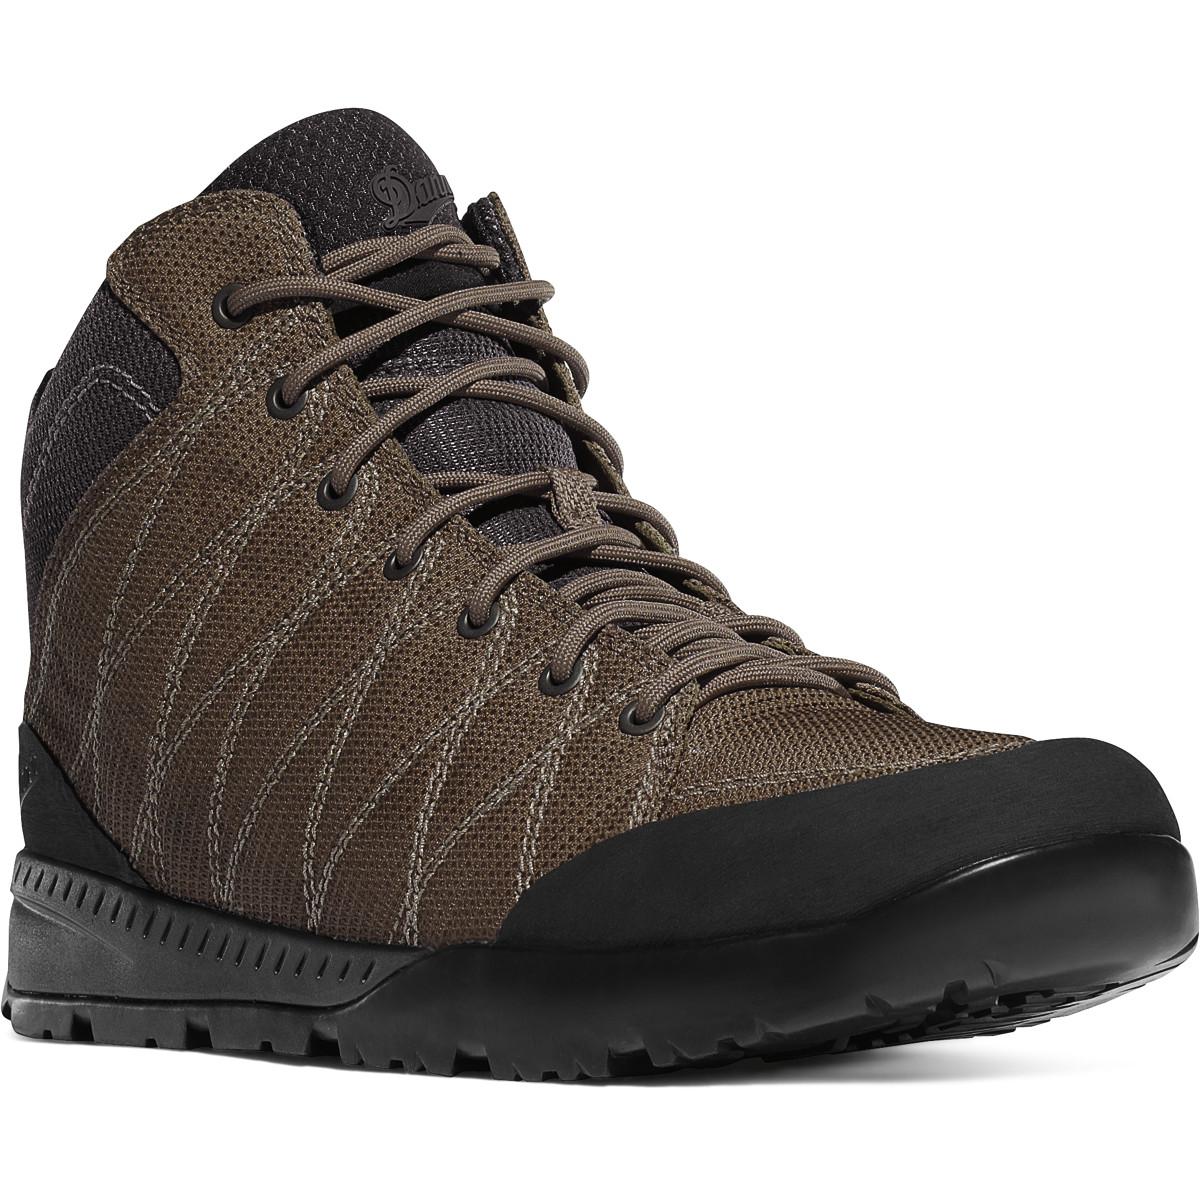 Danner Melee Canteen Tactical Boots